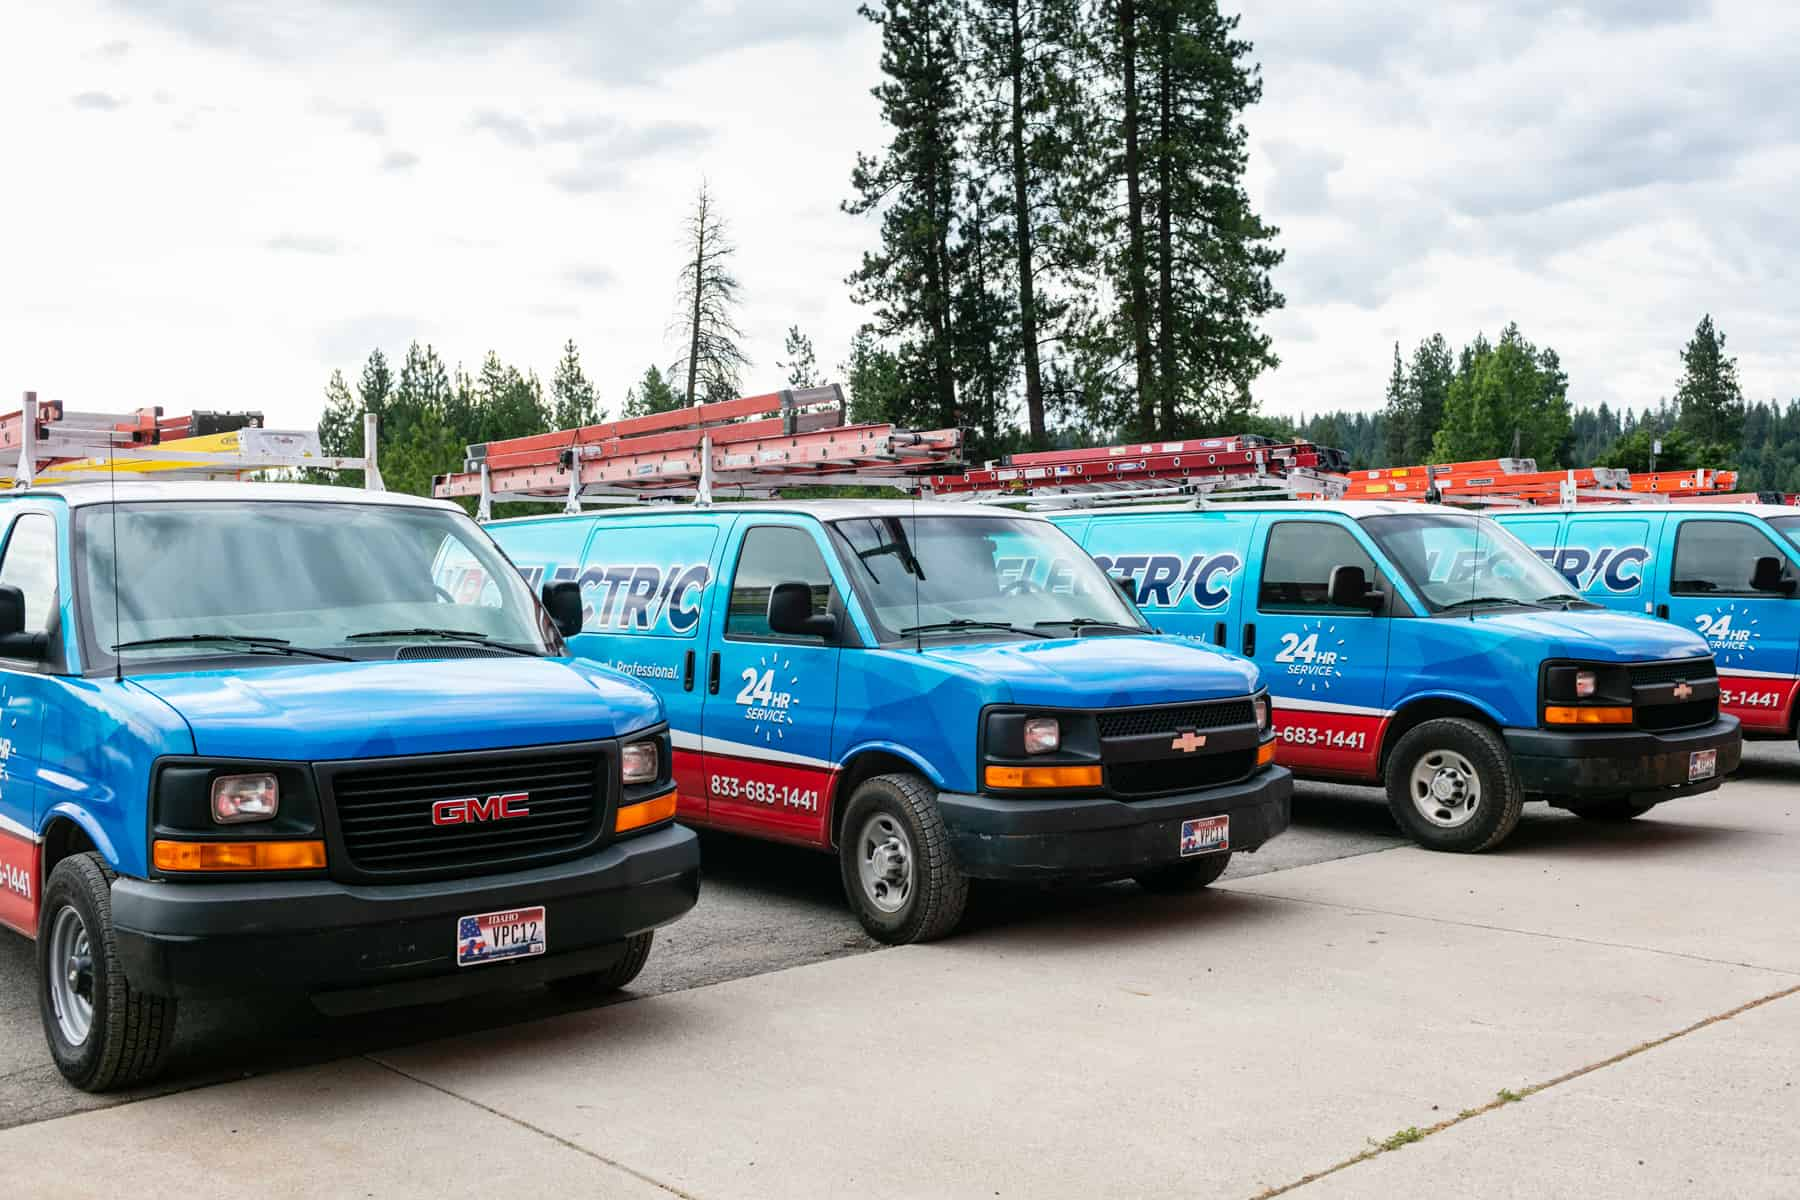 Spokane electrician services_fleet of VPC Electric service vans